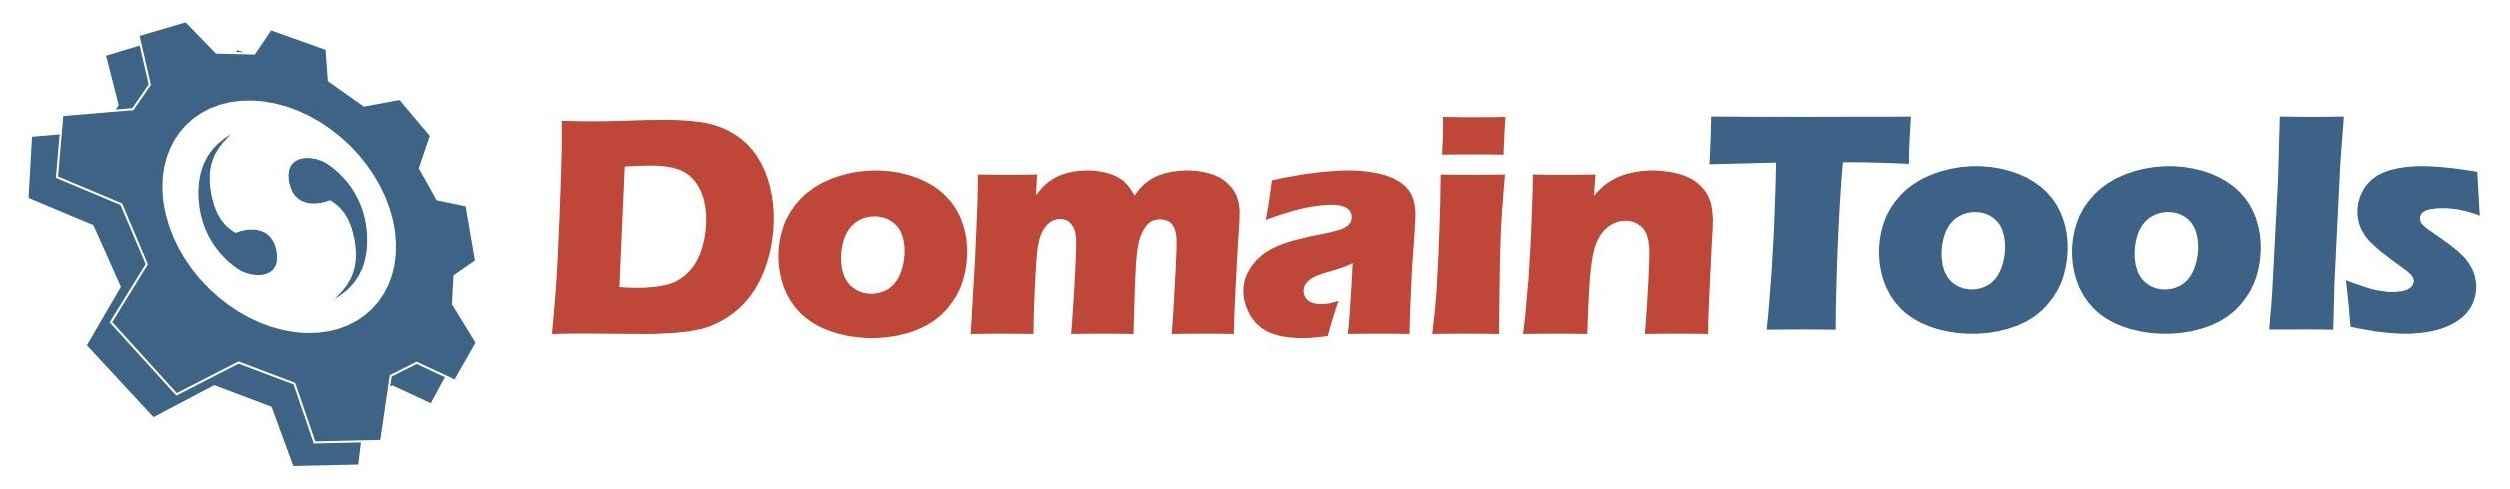 DomainTools.com Logo [EPS File] png